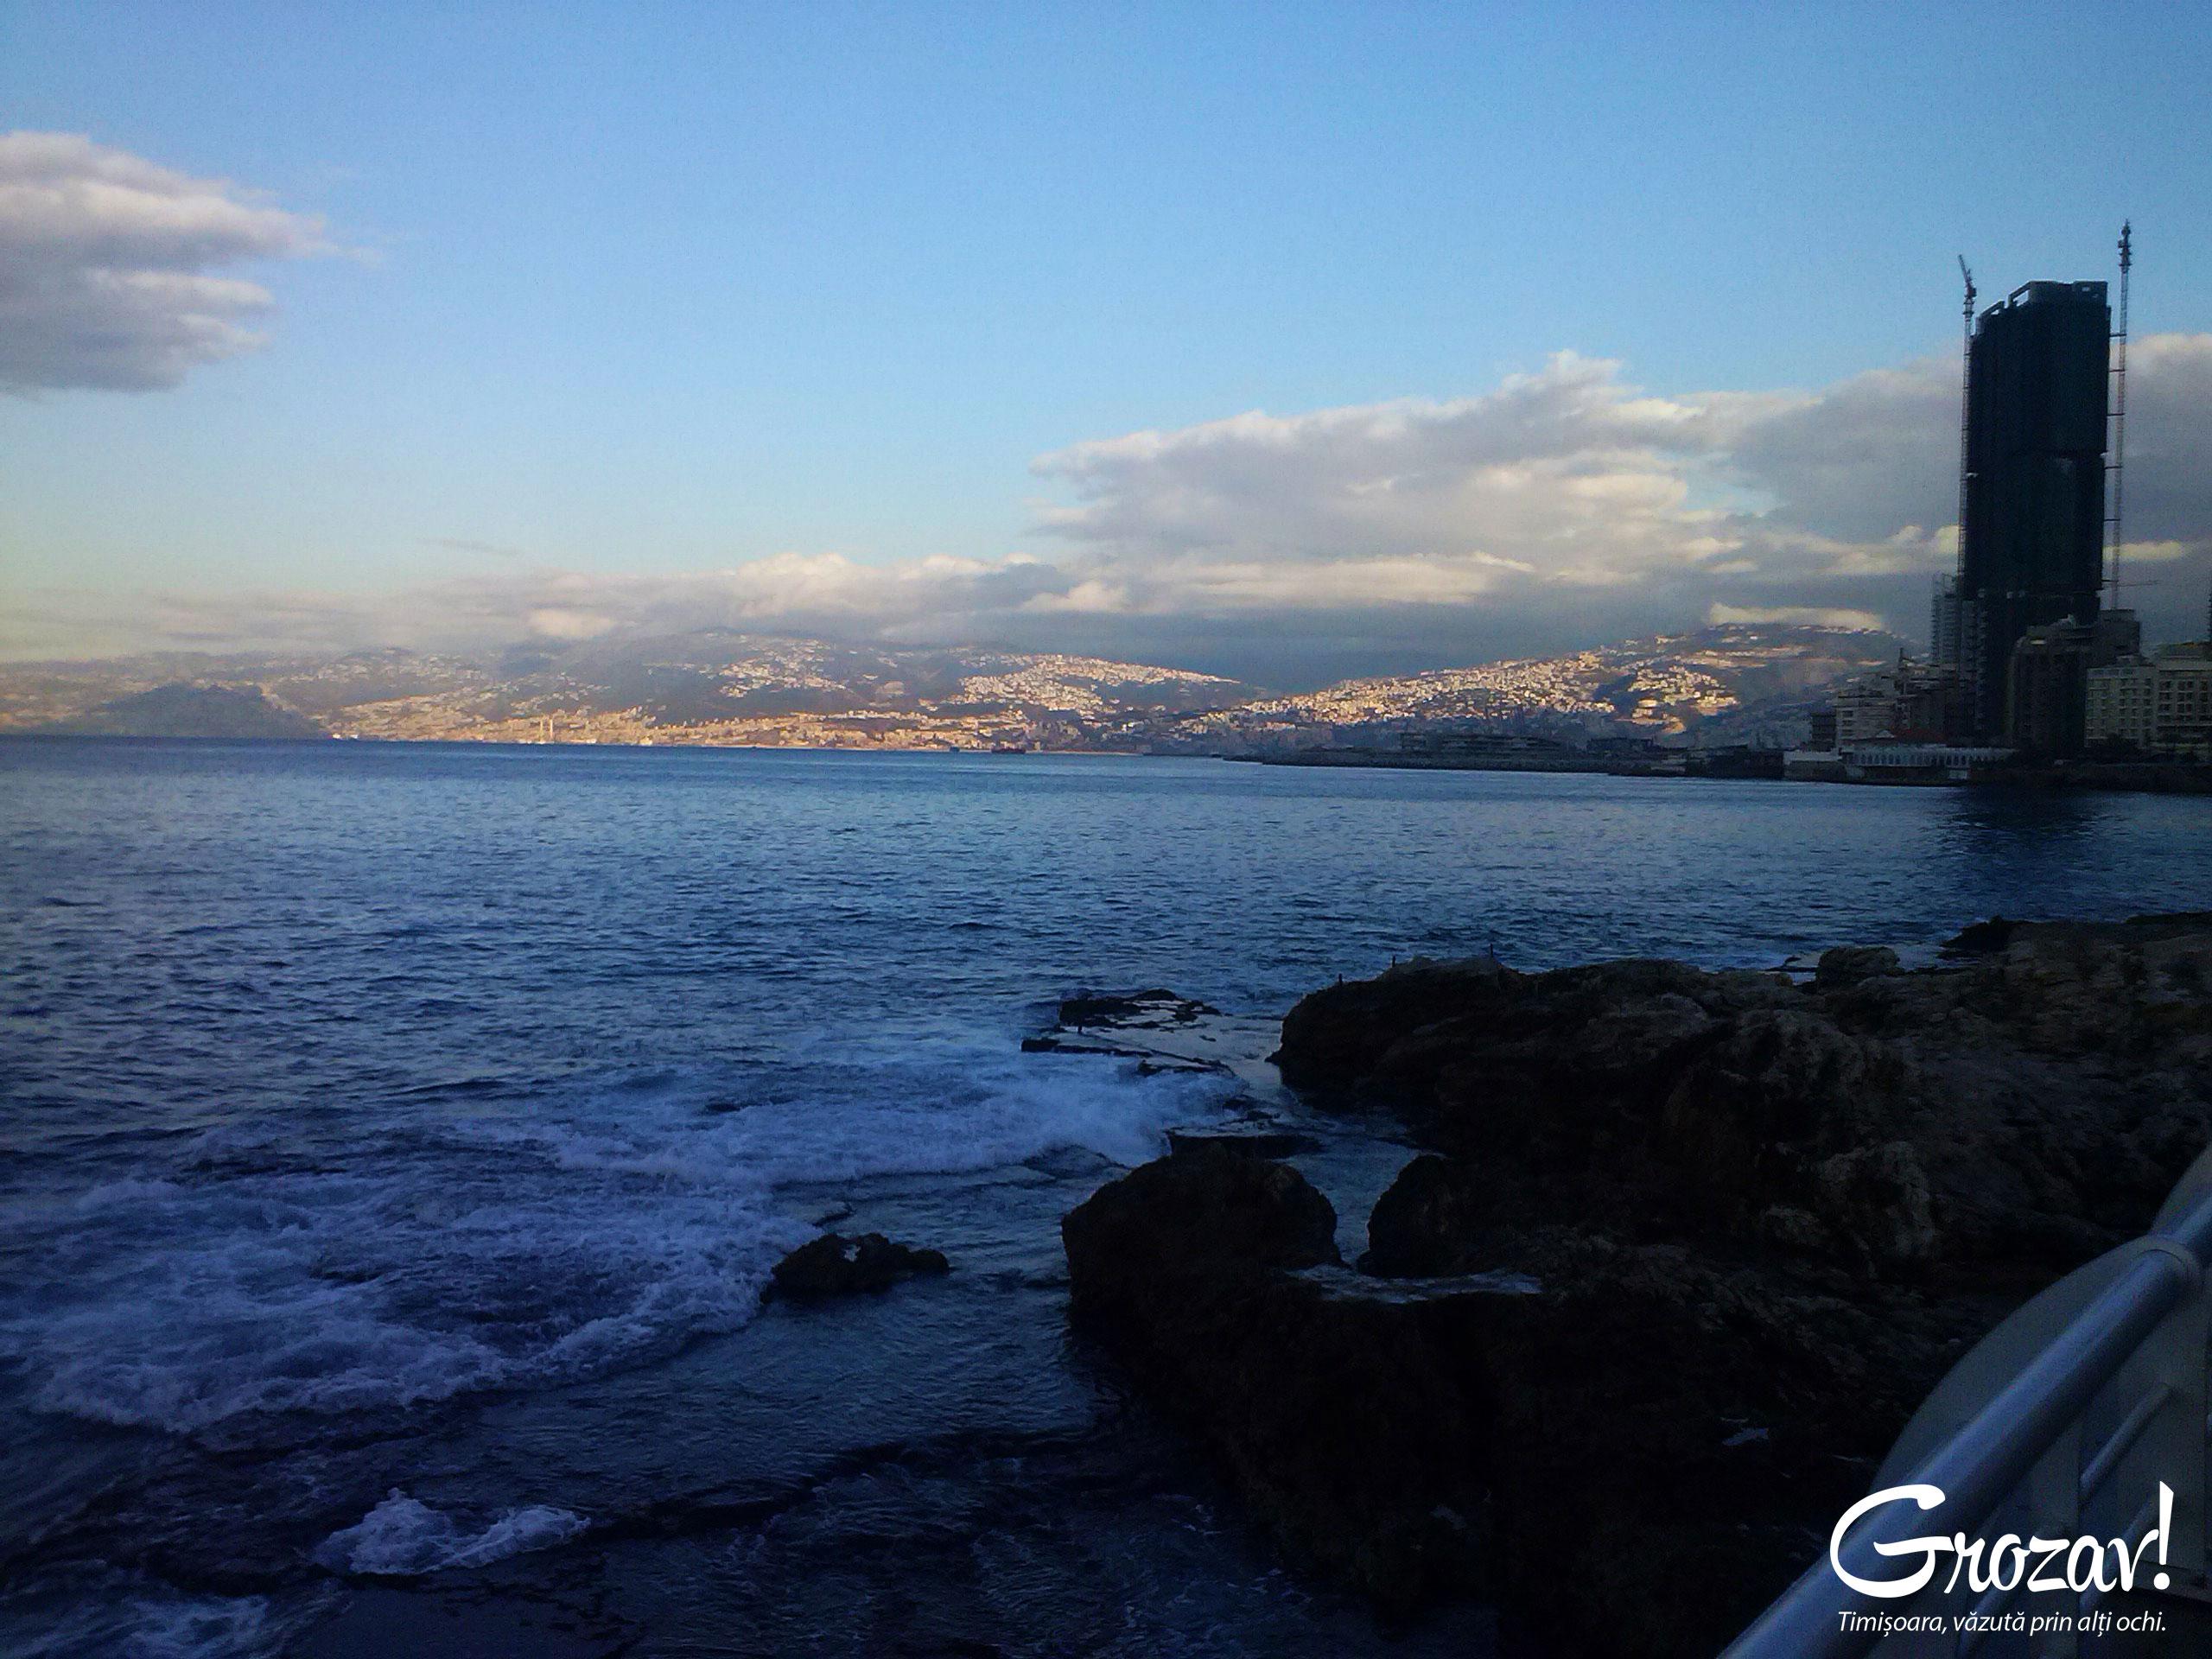 Marea in Liban